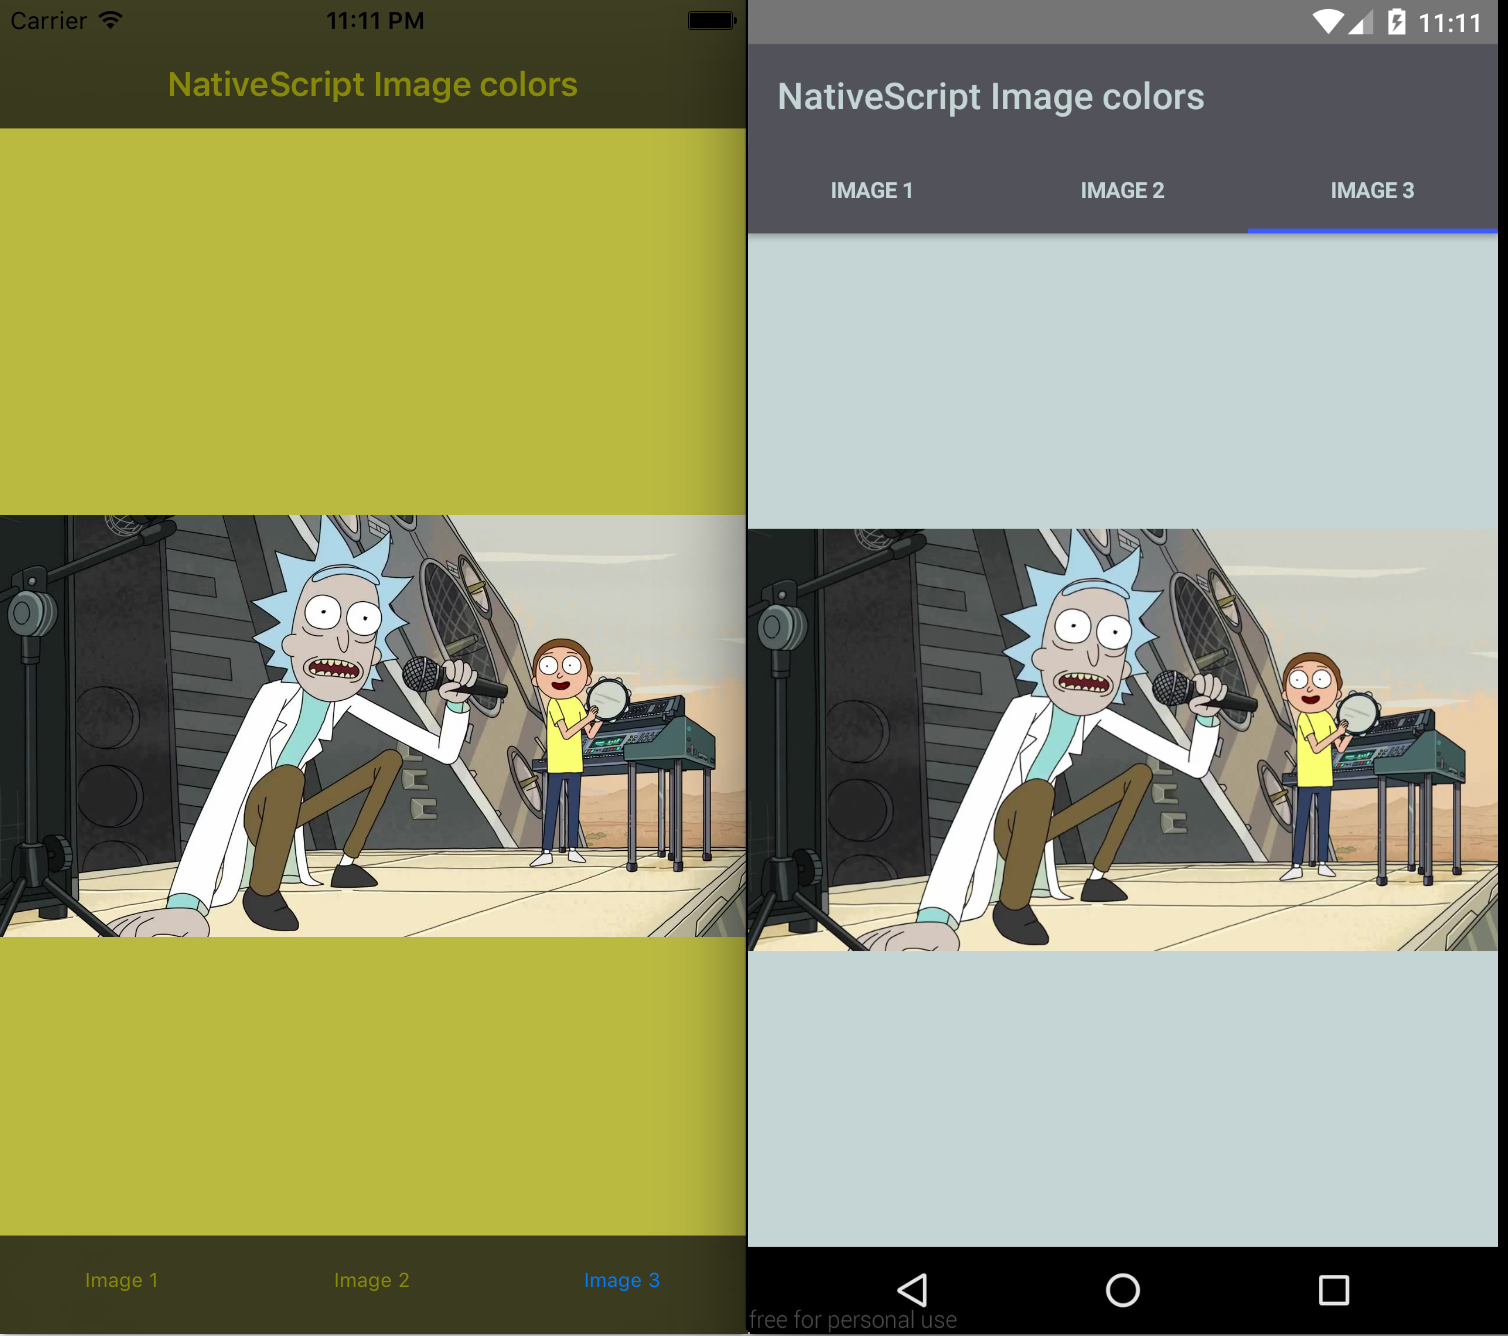 NativeScript image colors